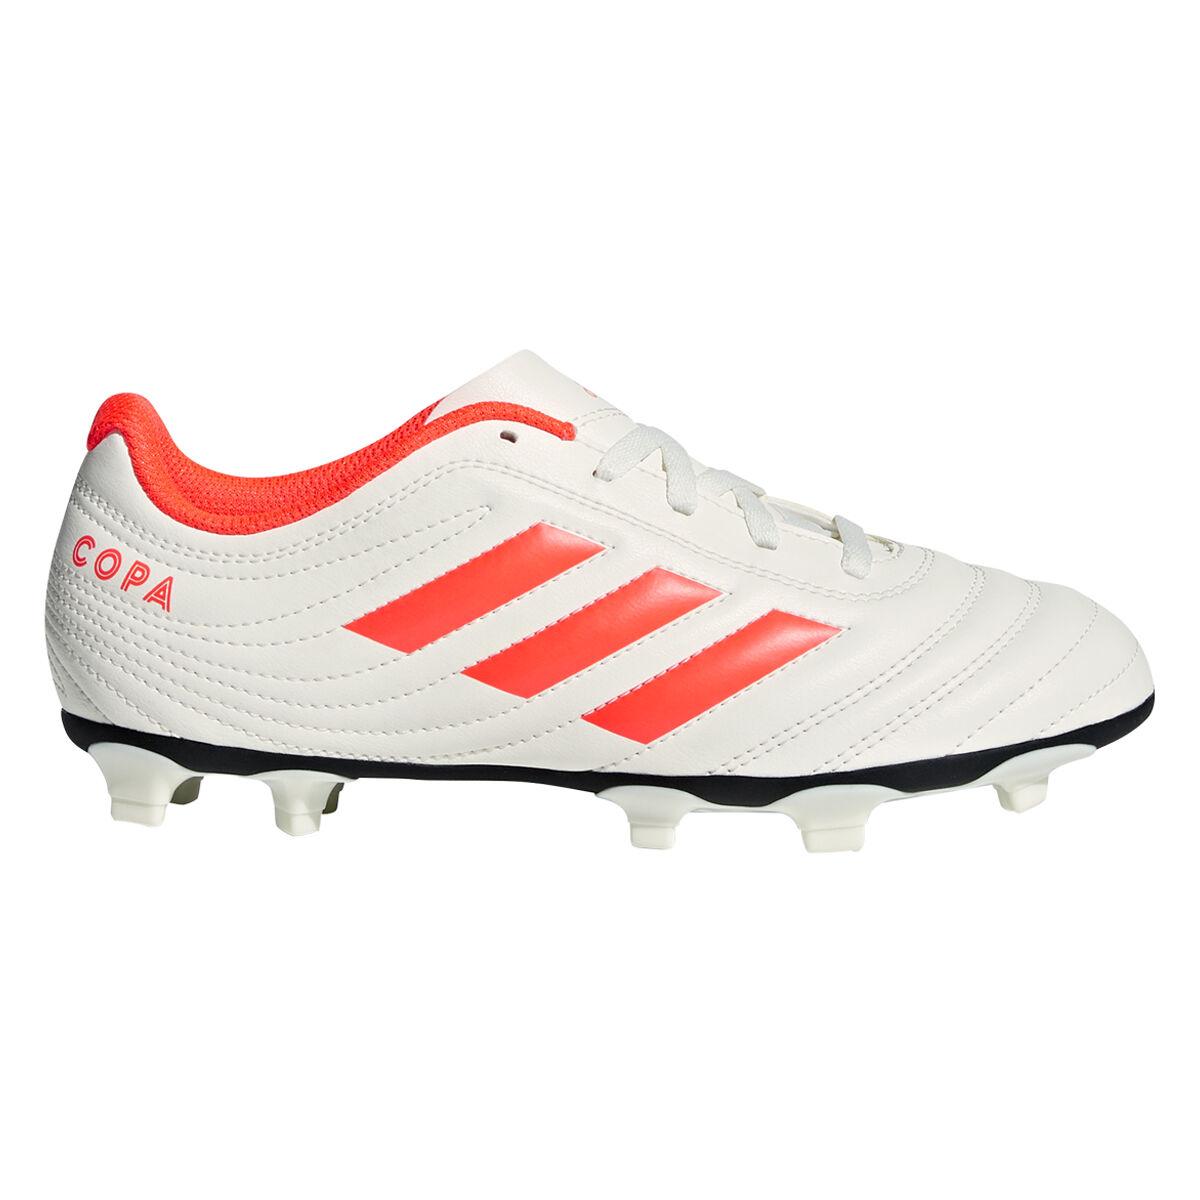 adidas Copa 19.4 Kids Football Boots